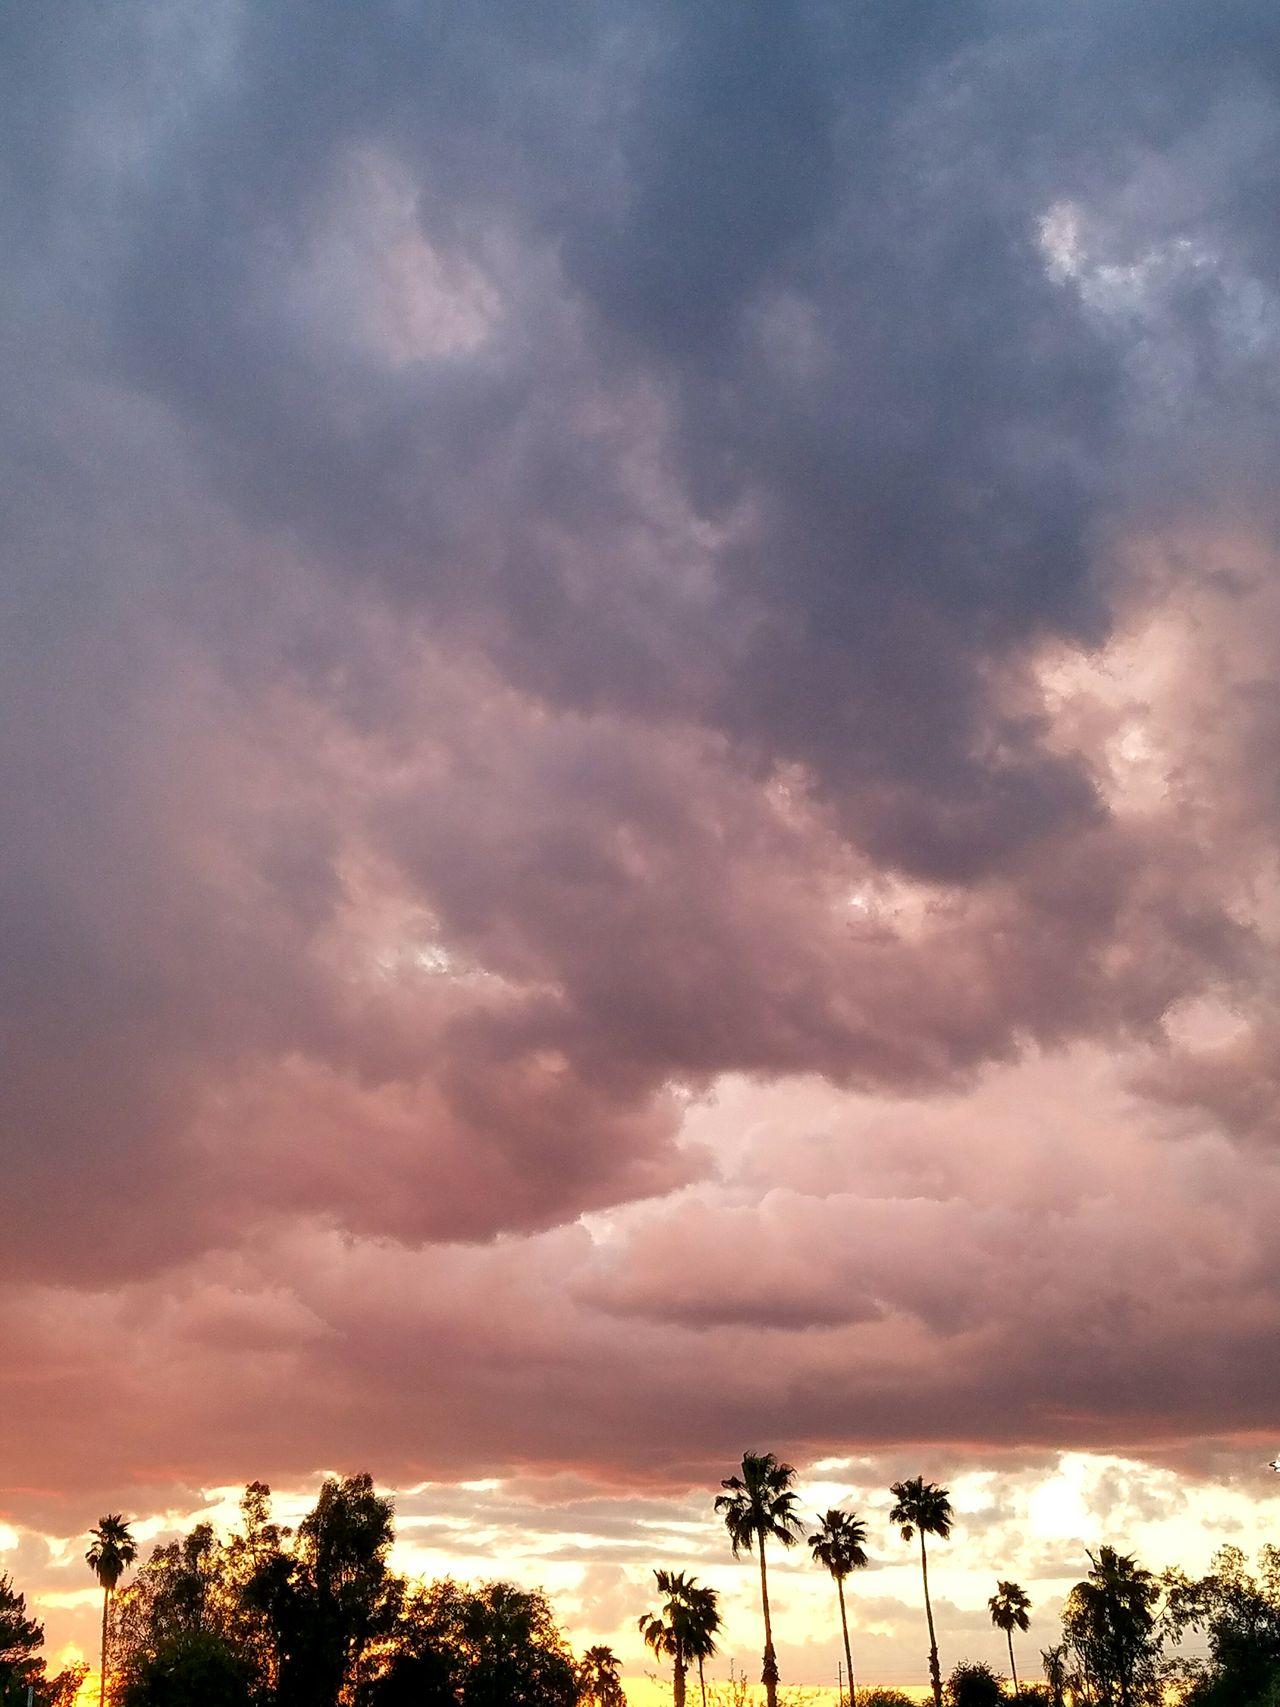 Dramatic Sky Storm Cloud Cloud - Sky Sunset Sky Cloudscape Thunderstorm Silhouette Beauty In Nature Palm Tree Premium Collection EyeEm Vision EyeEm Masterclass EyeEm Best Shots BestEyeemShots EyeEmBestEdits BestofEyeEm